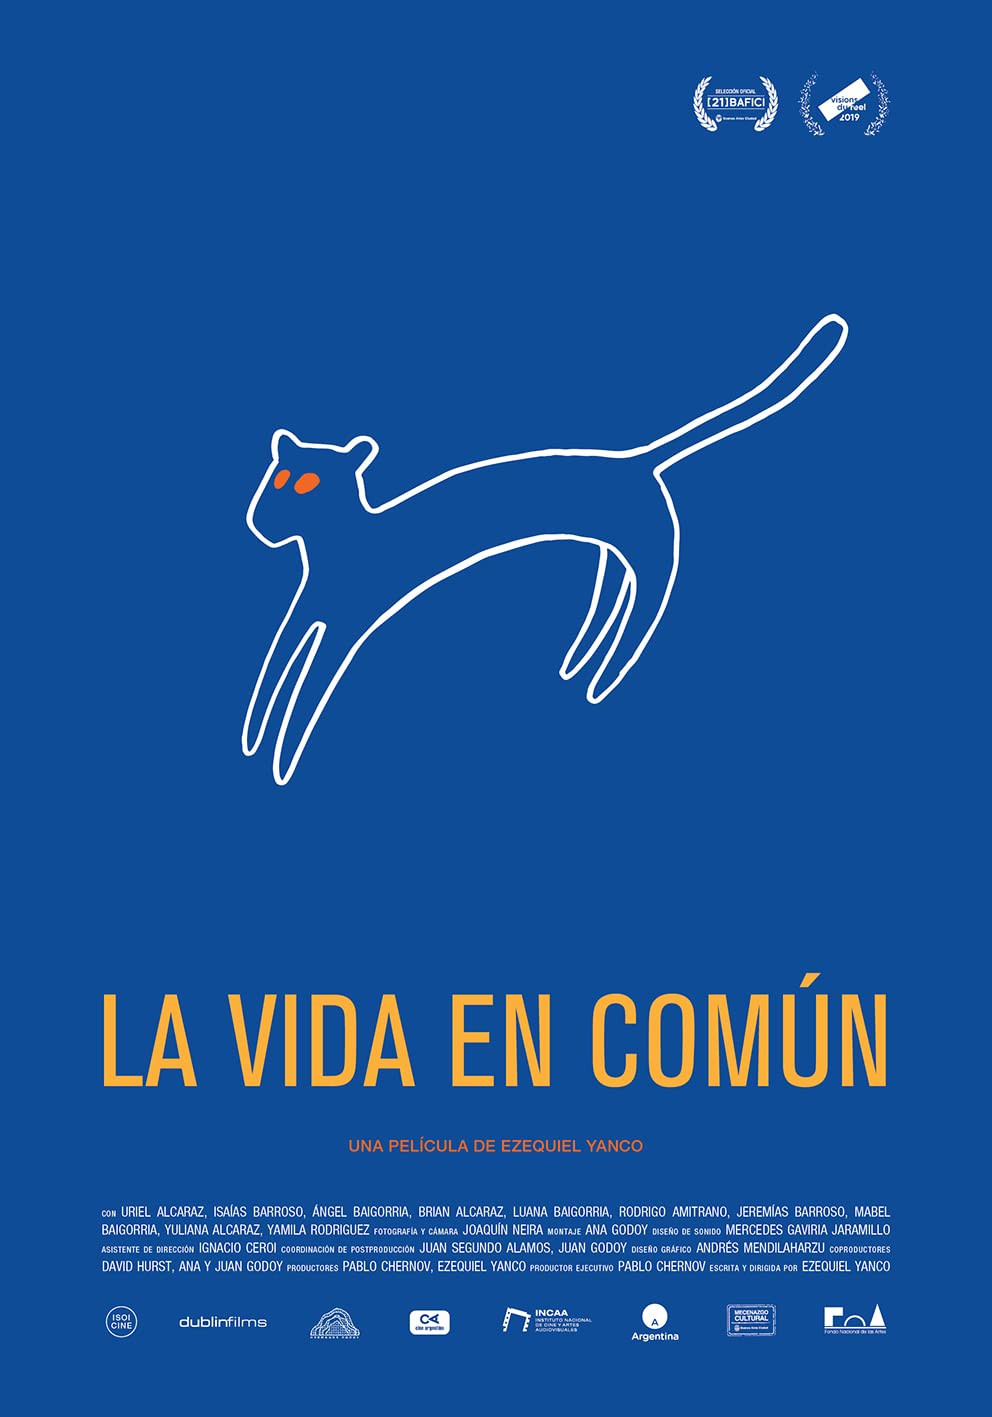 Poster for La Vida En Comun showing animation.